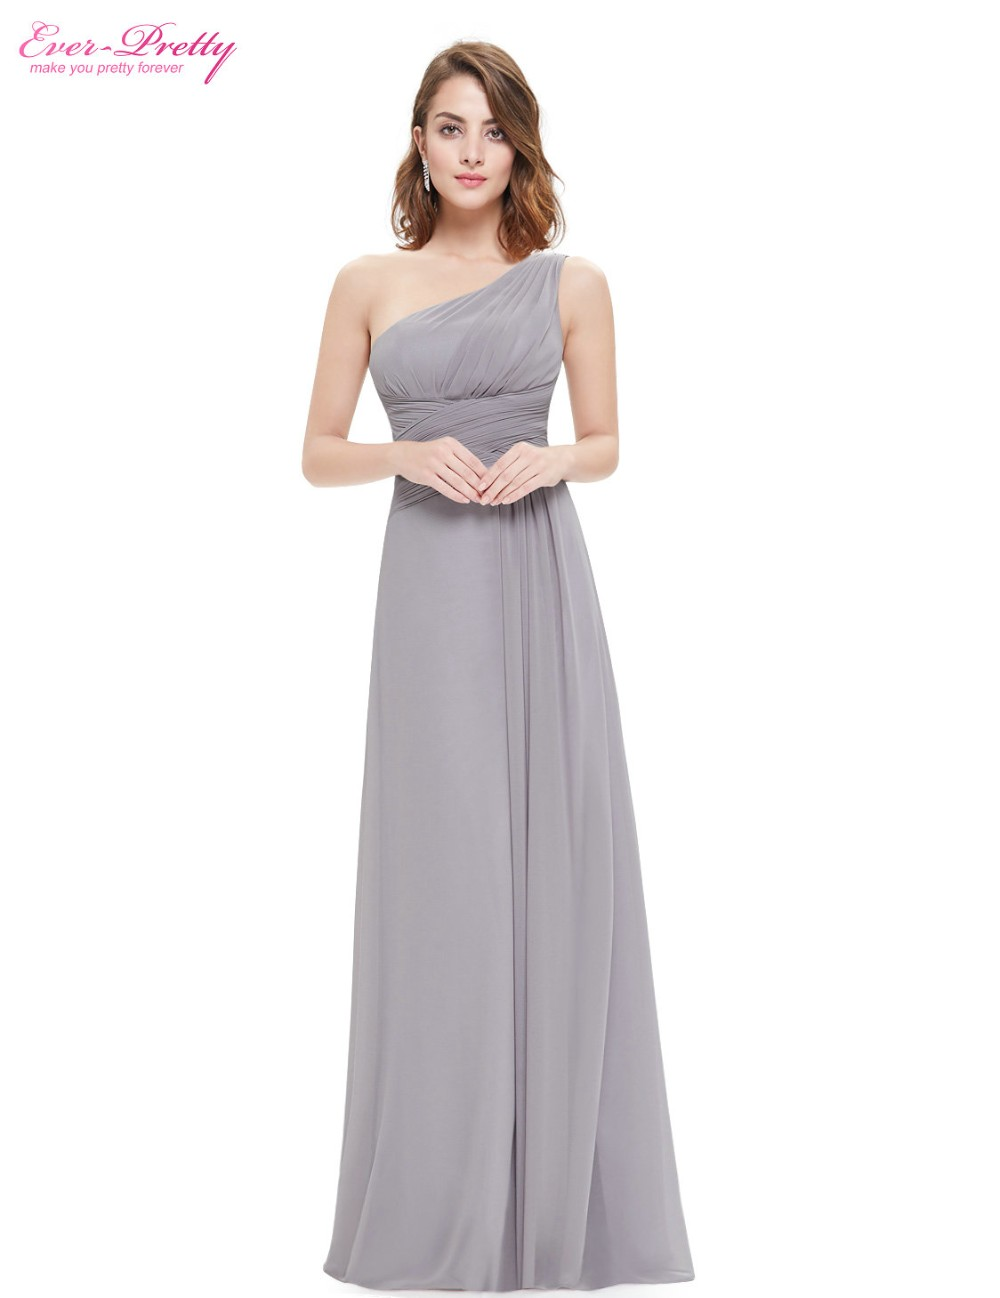 0acab910702 Grey Chiffon Evening Dresses Ever-Pretty EP09905 Elegant A-line 2018  Vestidos Chiffon Formal Party Dresses Floor Length